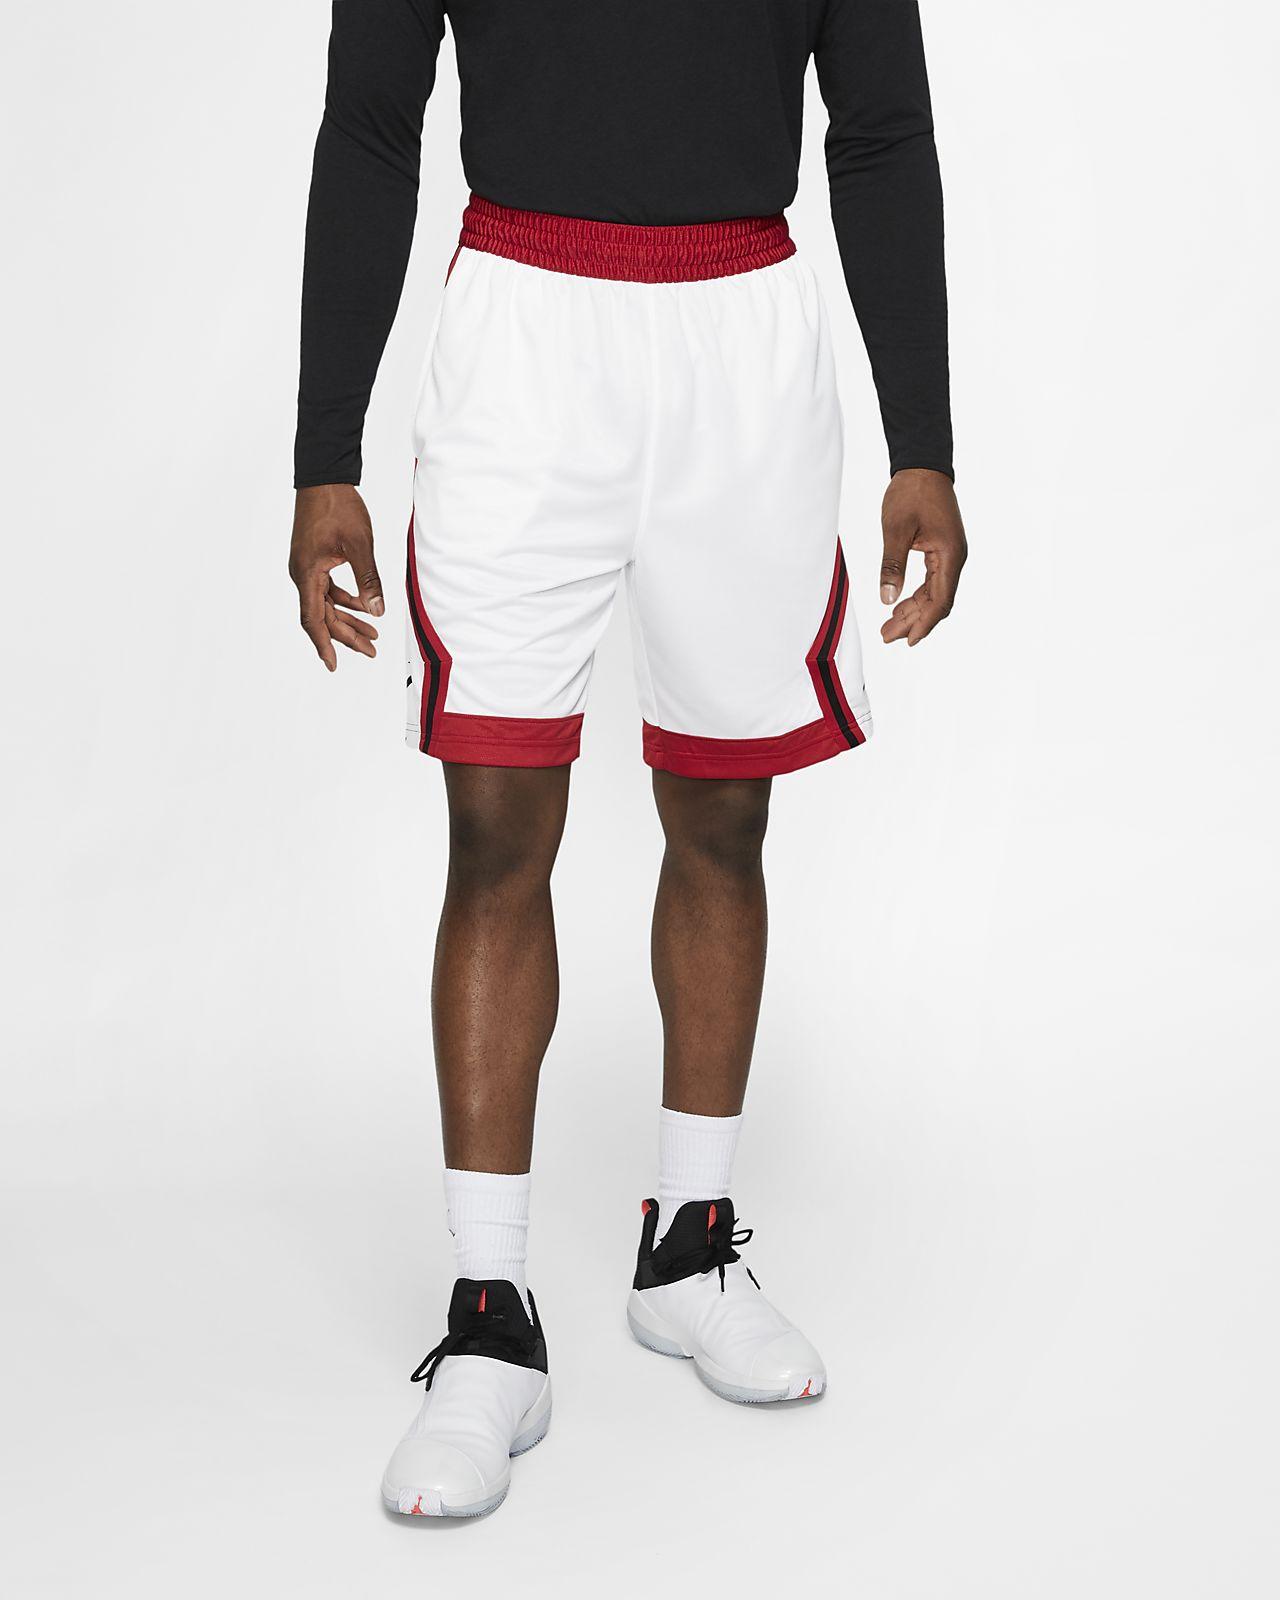 5b179a46e1c7 ... Short de basketball à rayures Jordan Jumpman Diamond pour Homme